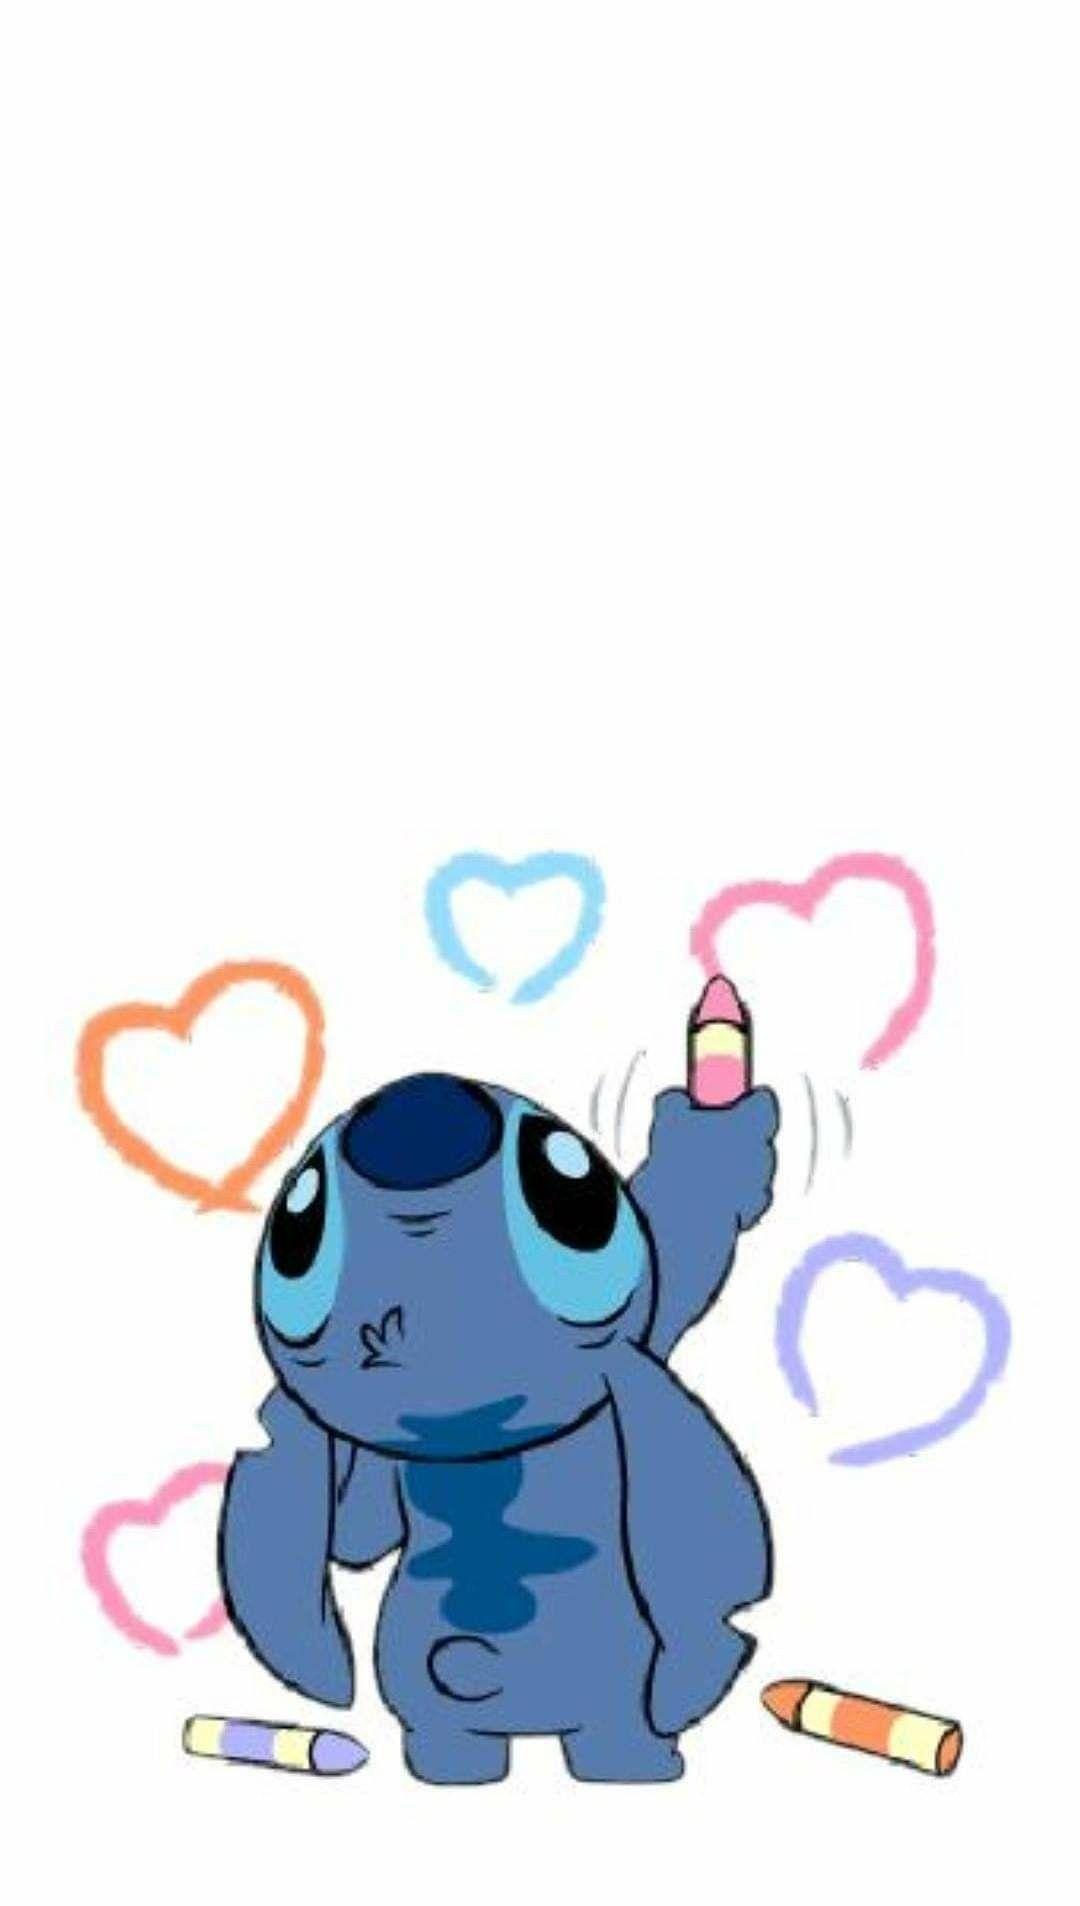 Stitch Cute Disney Wallpaper Stitch Cartoon Wallpaper Iphone Disney